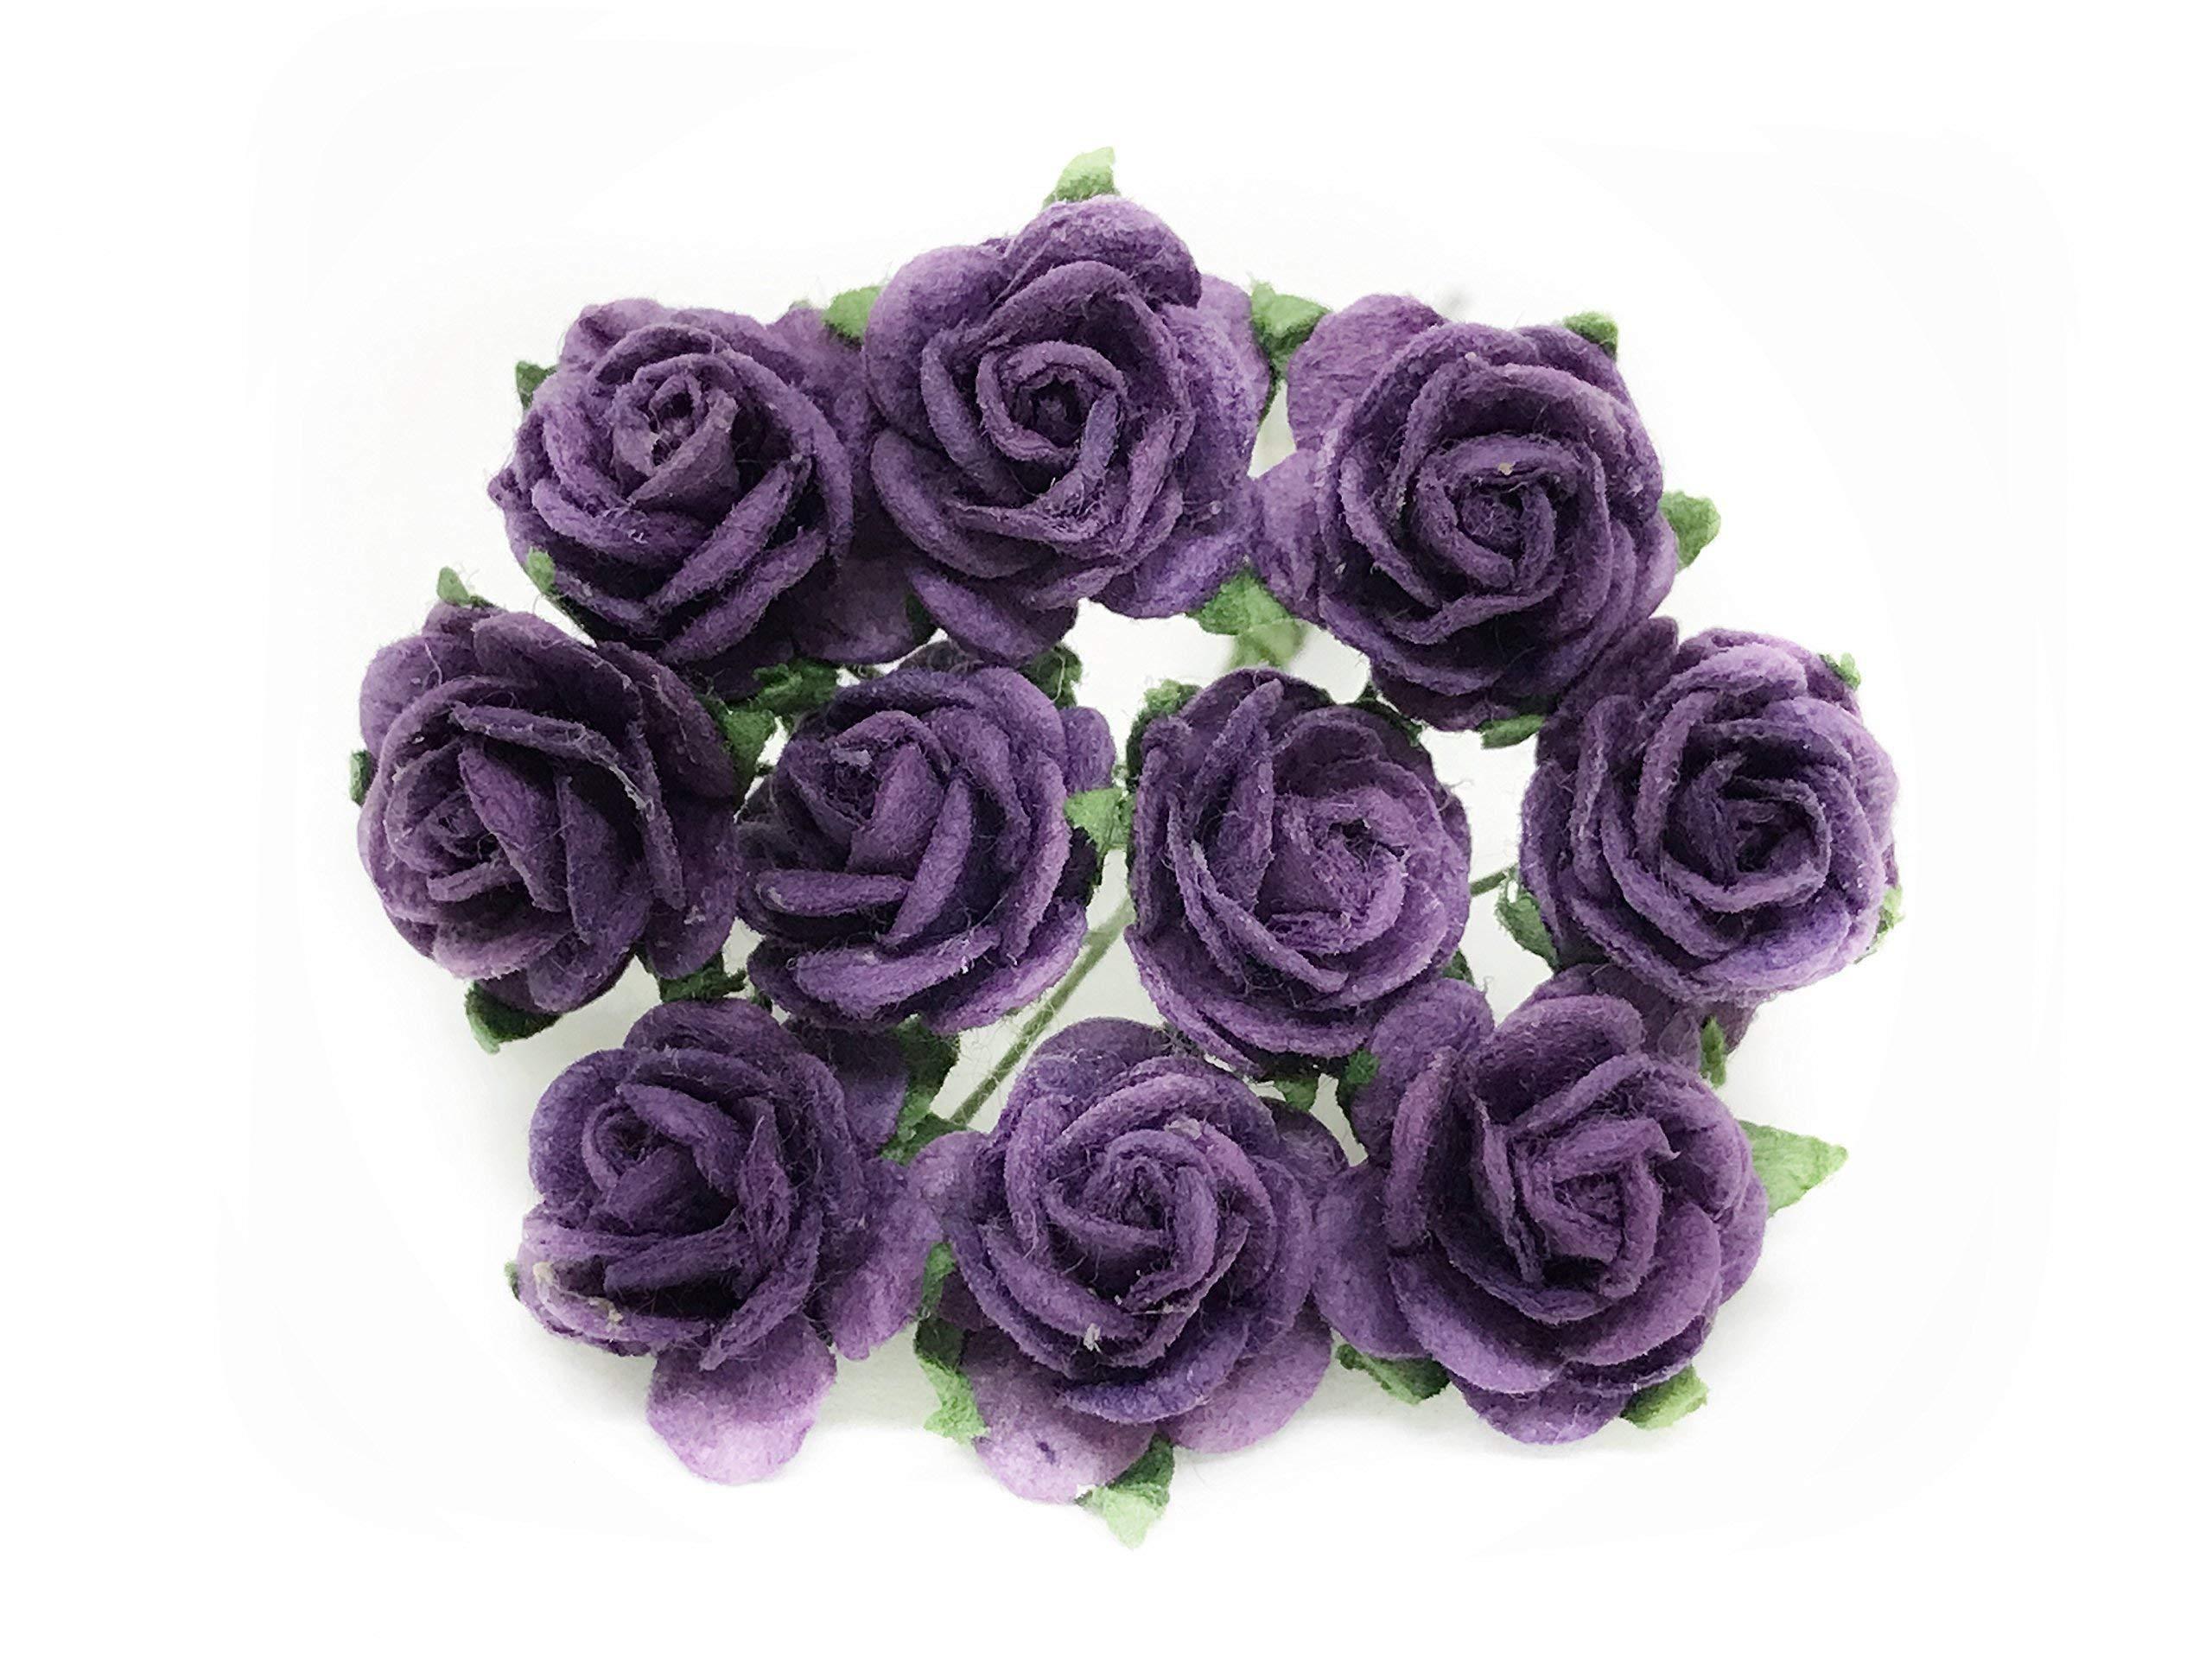 12-Plum-Purple-Mulberry-Paper-Flowers-Plum-Paper-Rose-Purple-Flowers-Floral-Crown-Flowers-DIY-Wedding-Wedding-Decor-Wedding-Table-Flowers-Plum-Wedding-Artificial-Flowers-50-Pieces